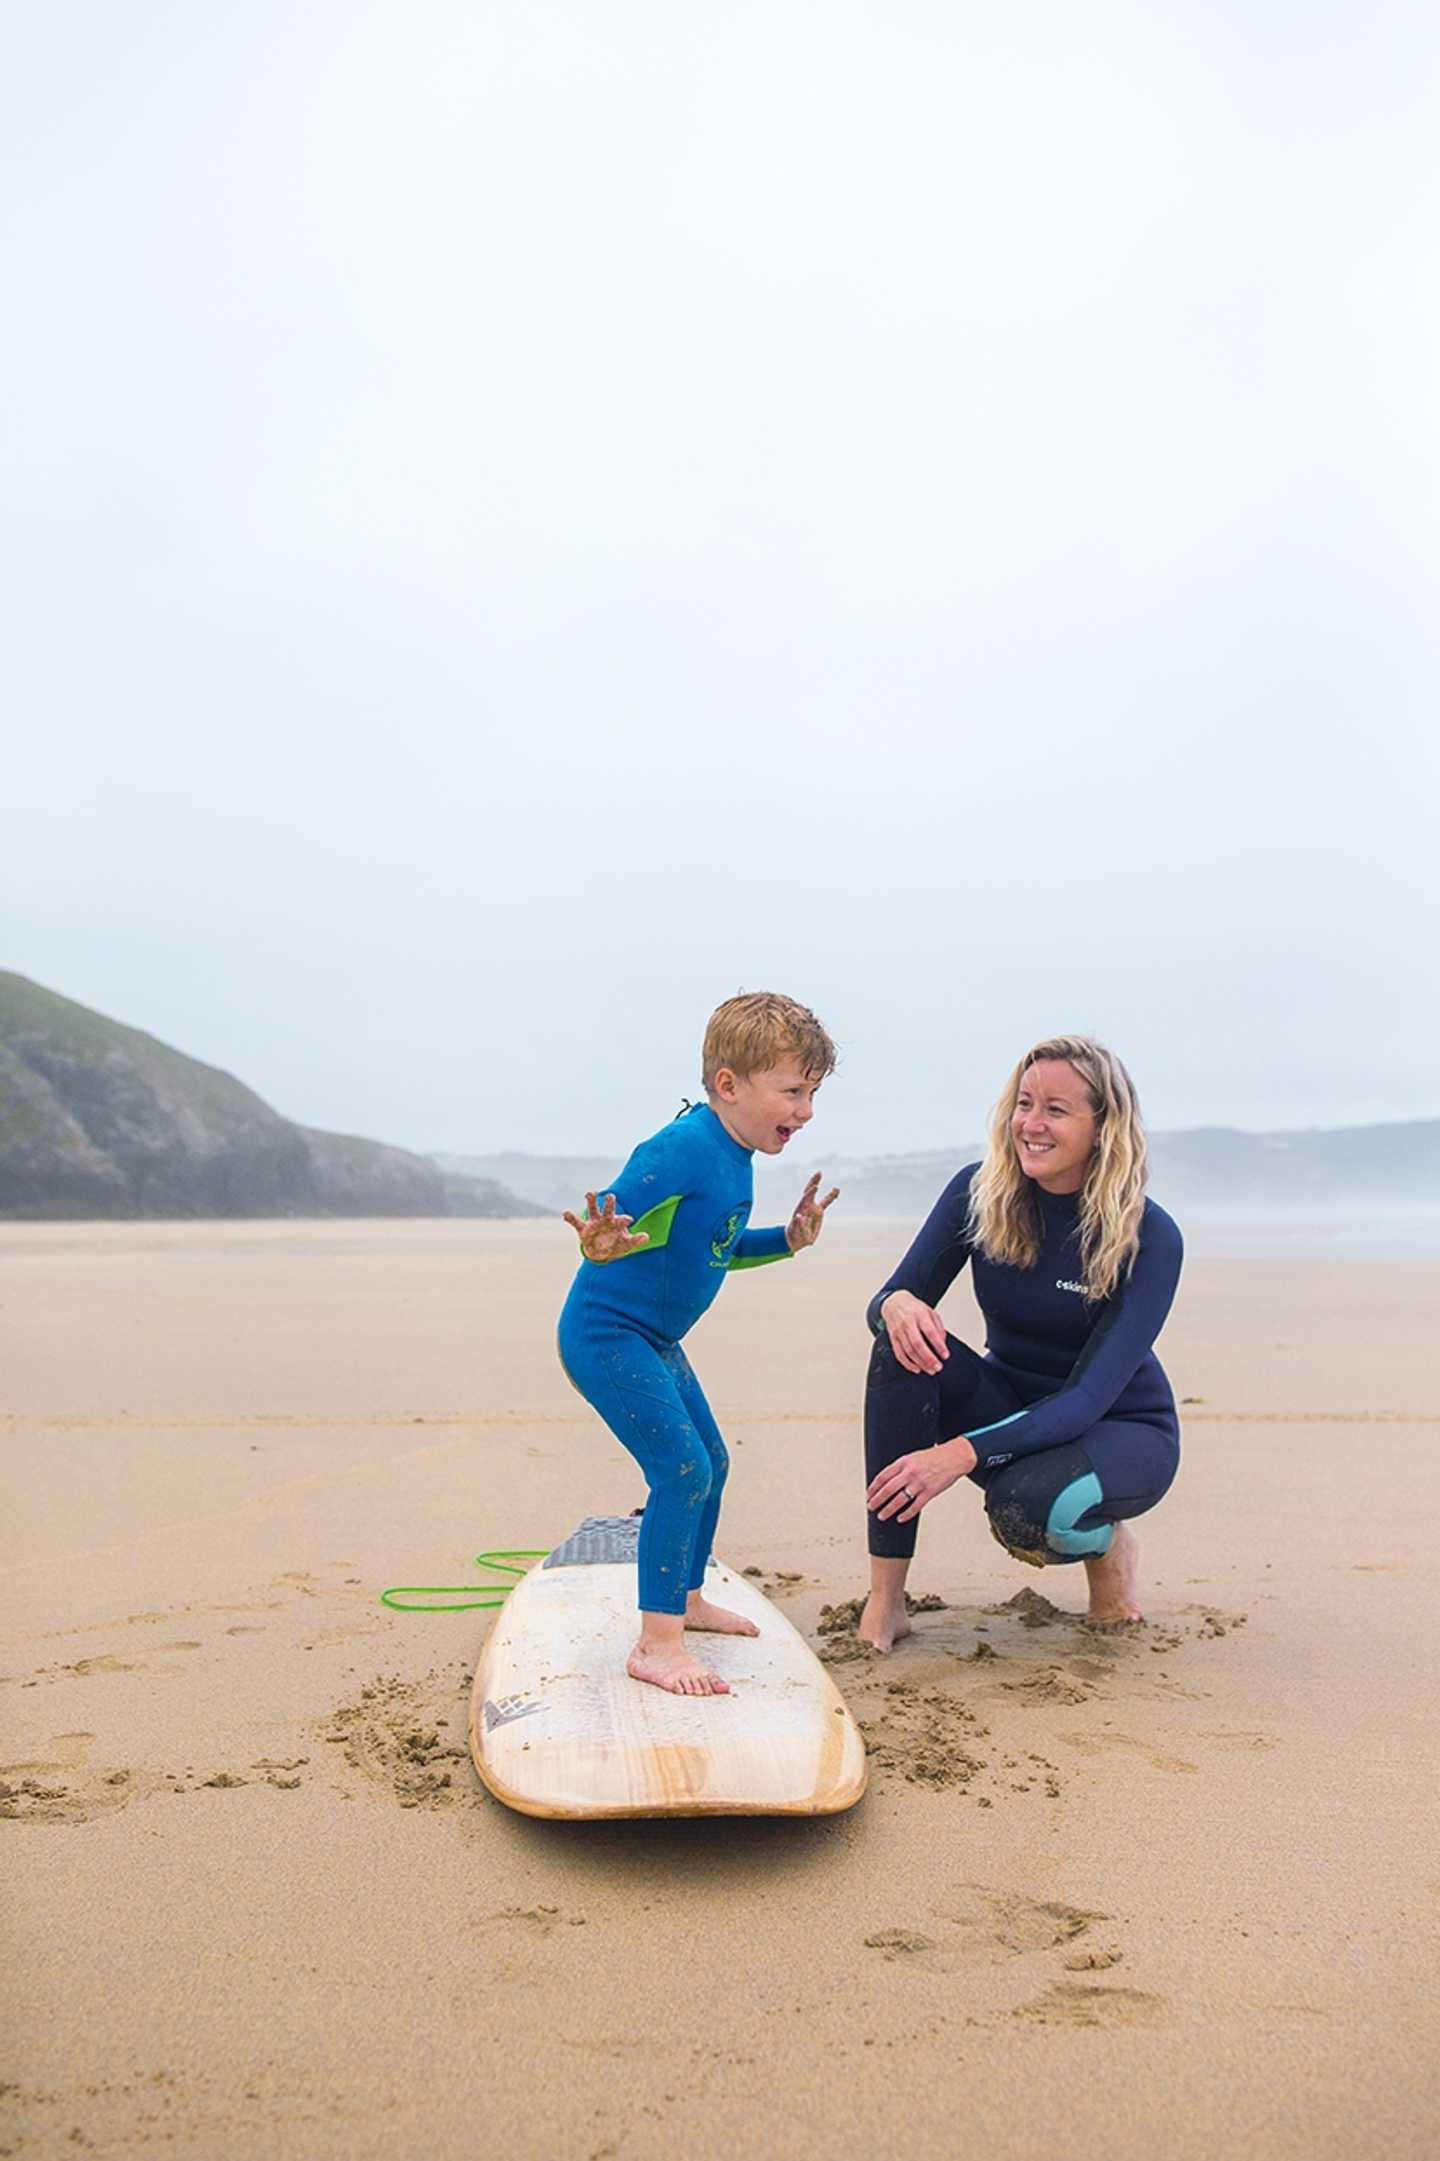 Boy balancing on a surfboard on sand